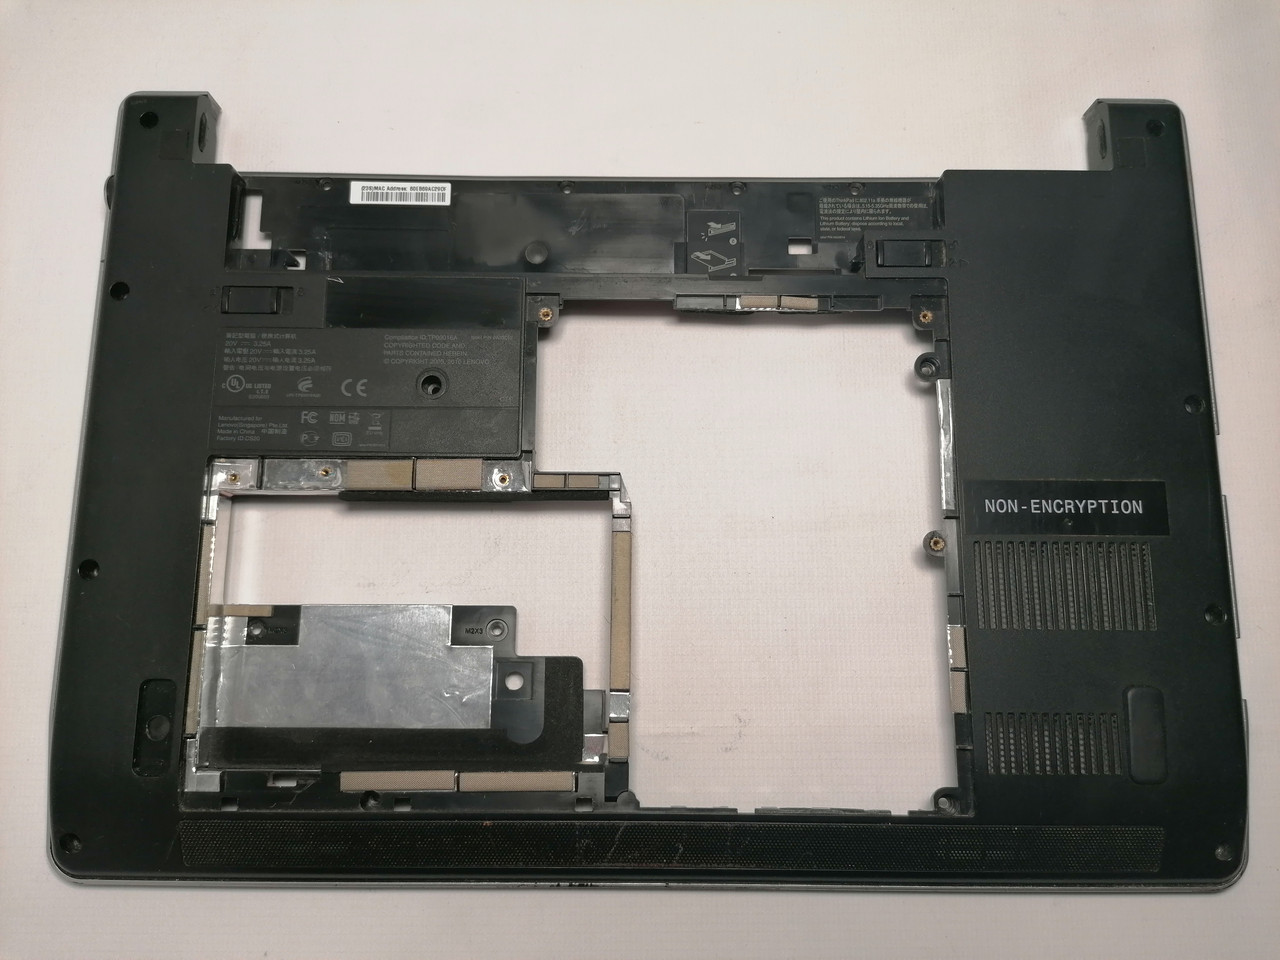 Б/У корпус поддон (низ) для LENOVO ThinkPad Edge 13, E30, E31 (34PS2BSLV00) 04W0349